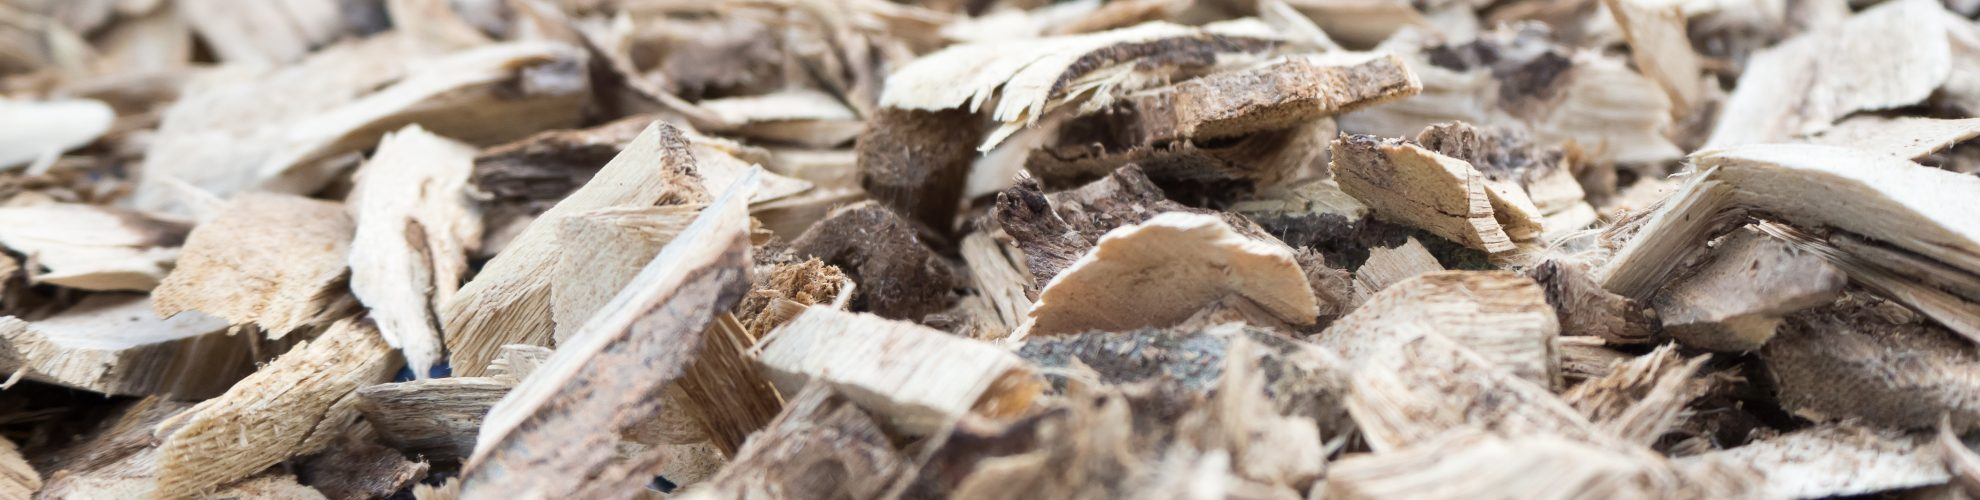 Dry barks for making herbs.